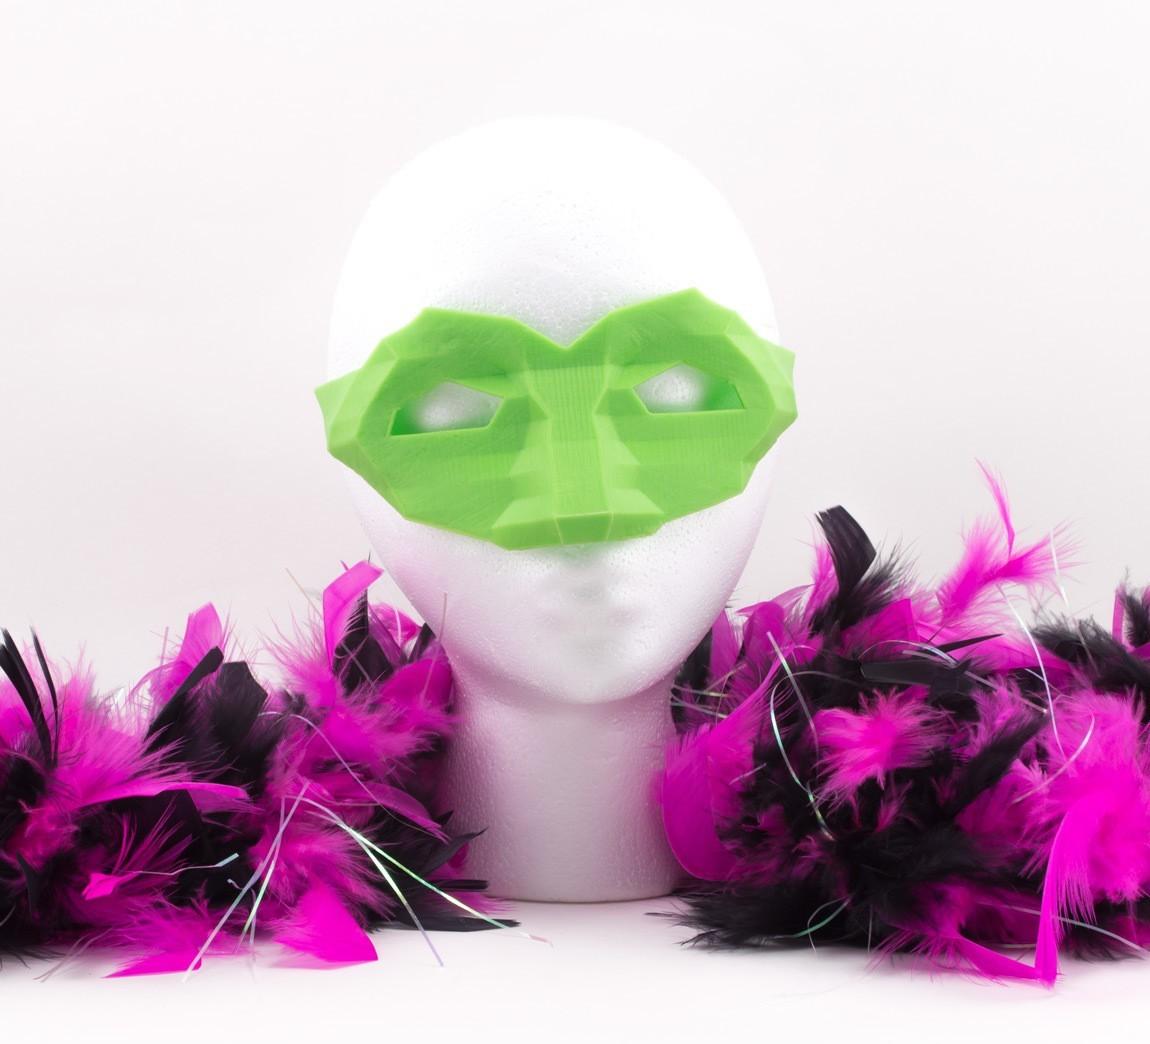 27cf480d69dc6e31c3f473c33fa69e8c_1443223992707_NMD000210-094_@2x.jpg Download free STL file Masquerade Mask • 3D print model, Lucy_Haribert